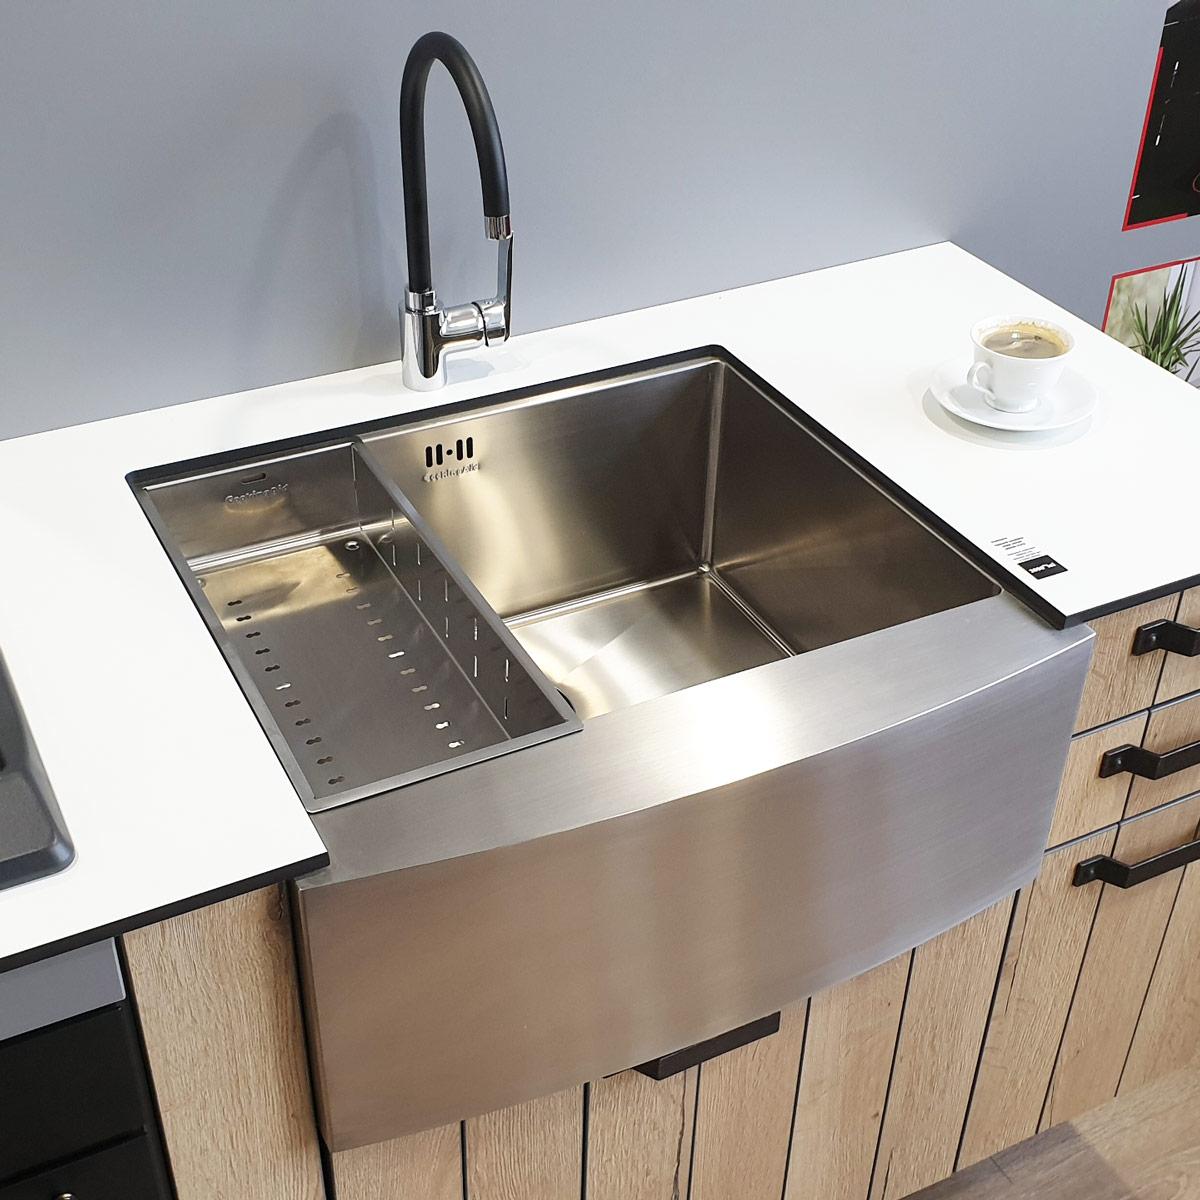 Chiuveta-Bucatarie-CookingAid-Apron-Standard-2a